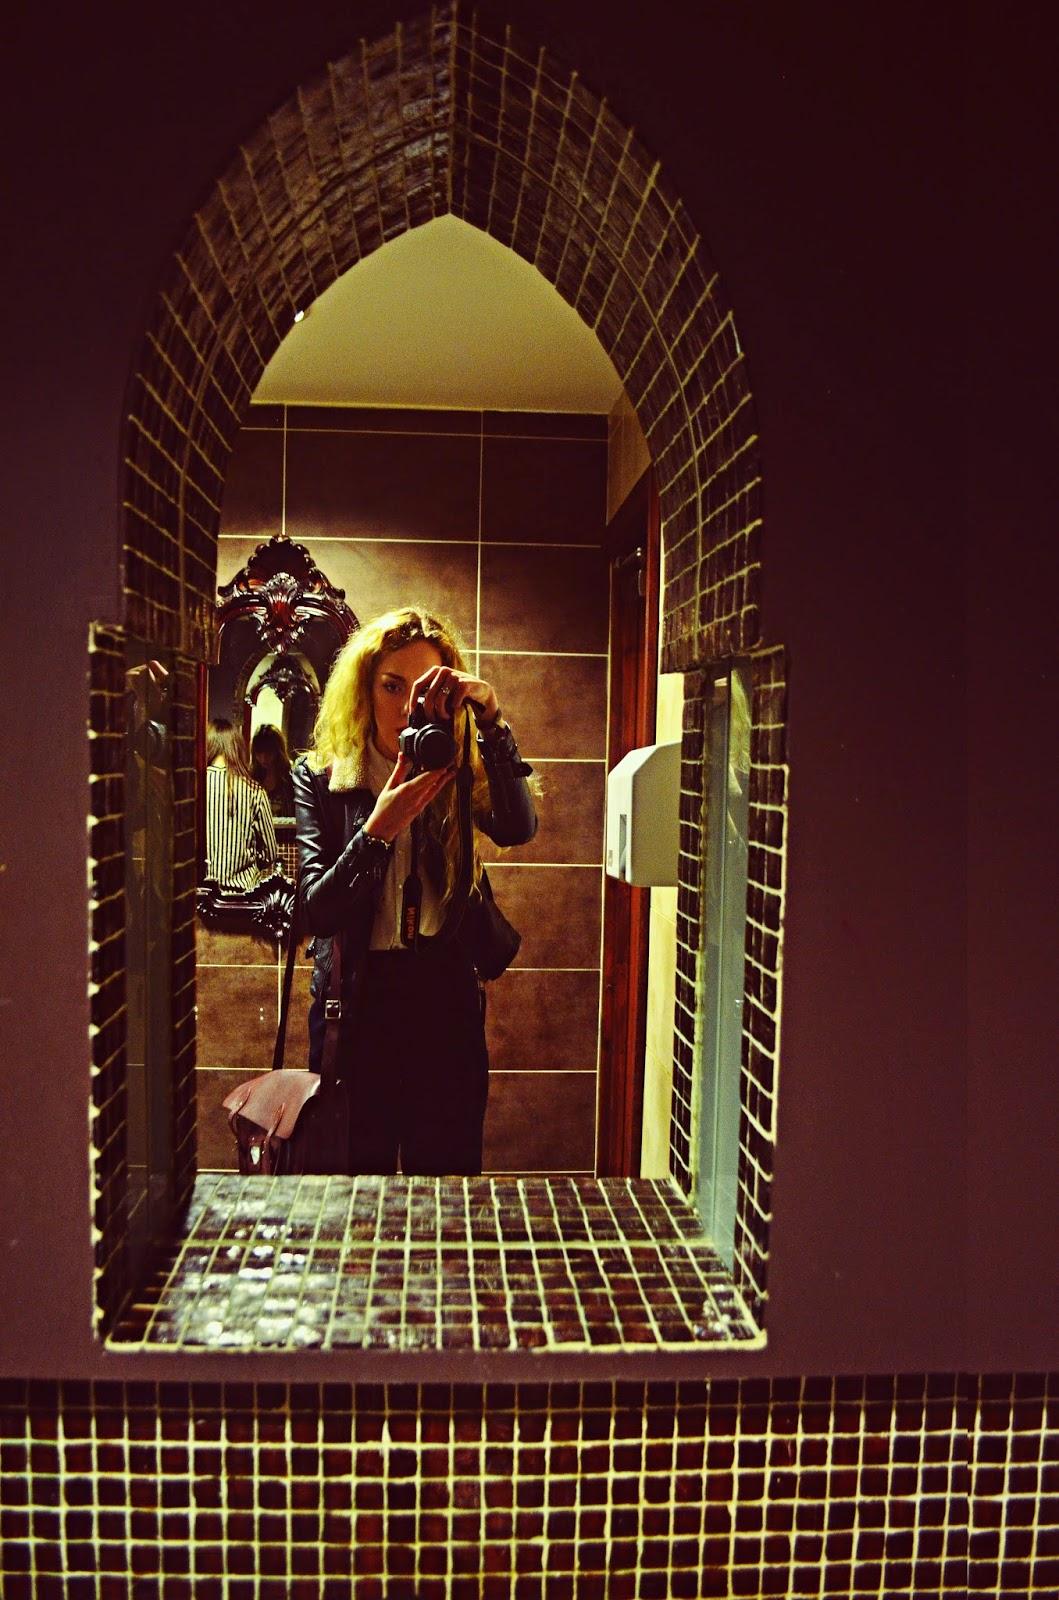 Stephi, stephi lareine, lareine, fashion, fashion blog, fashion blogger, uk fashion blogger, beauty blogger, beauty blog, uk beauty blog, life style blog, lifestyle blogger, uk lifestyle blog, northwest uk, photographer, graphic designer, motel, motelrocks, missguided, ax paris, topshop, urban outfitters, new look, primark, lfw, Liverpool, portrait fashion, lookbook, tumblr, pinterest, twitter, facebook, bloglovin, pastel hair, vintage, diy, nail art, ootd, liverpool kimo's, selfie, blonde, camera, plaid pants, leather jacket